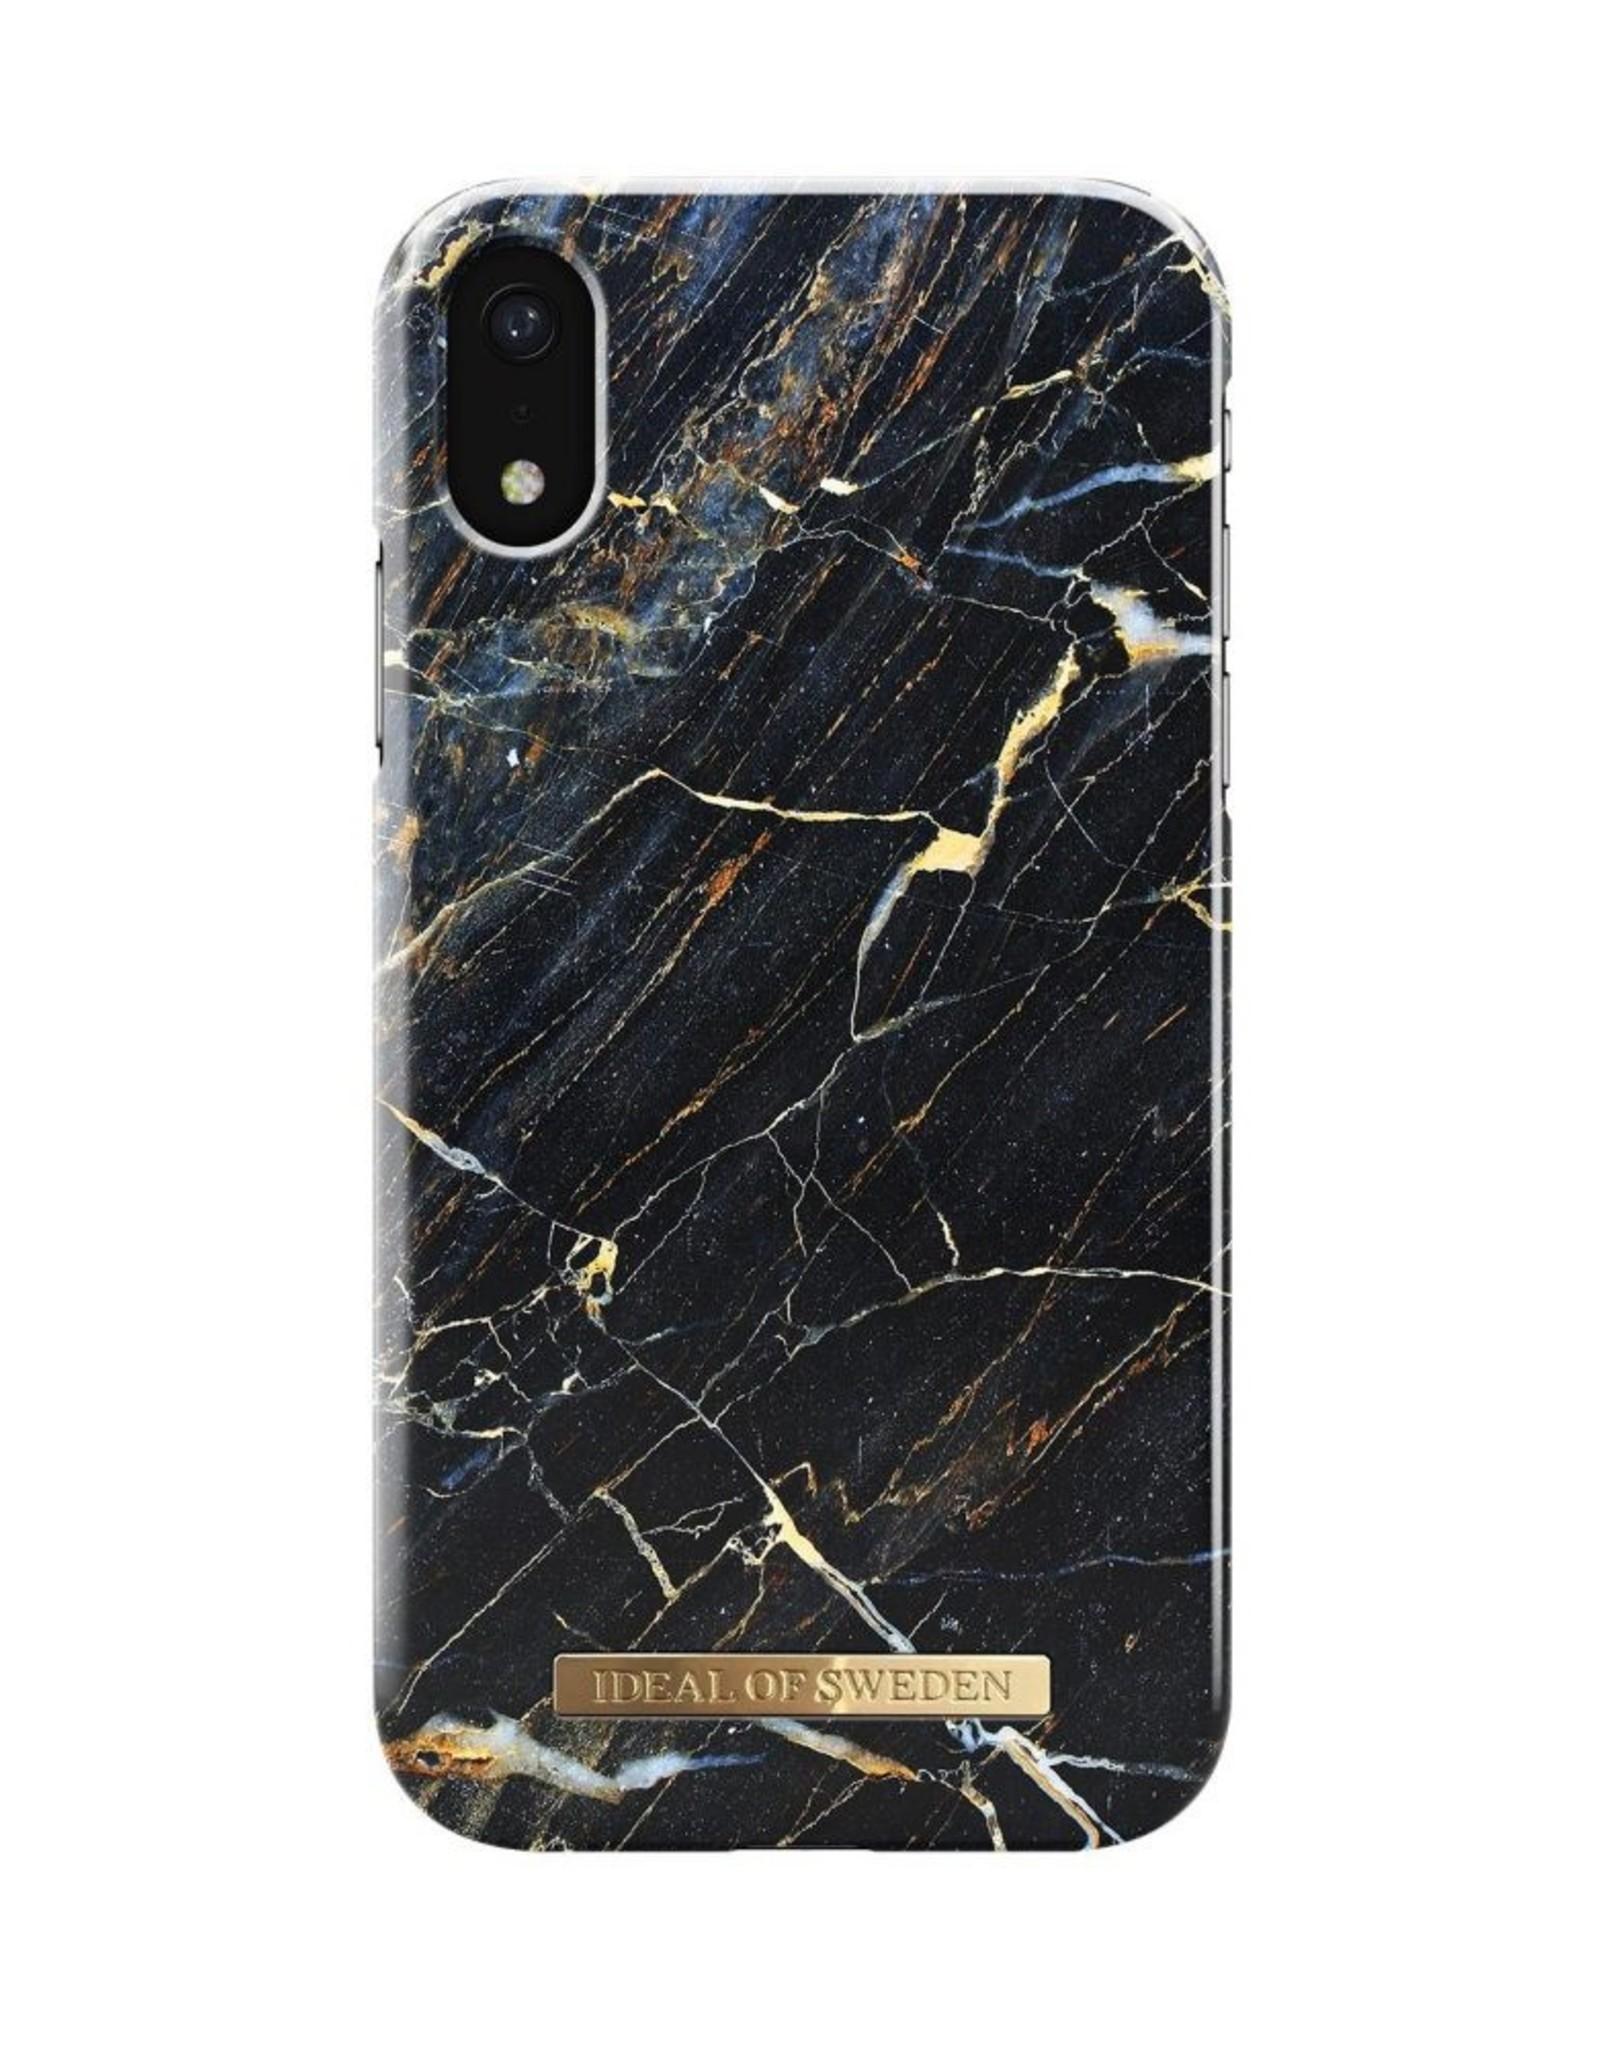 iDeal of Sweden /// iDeal of Sweden | Fashion Case for iPhone 11 Port Laurent Marble C-IDFCA16-I1961-49